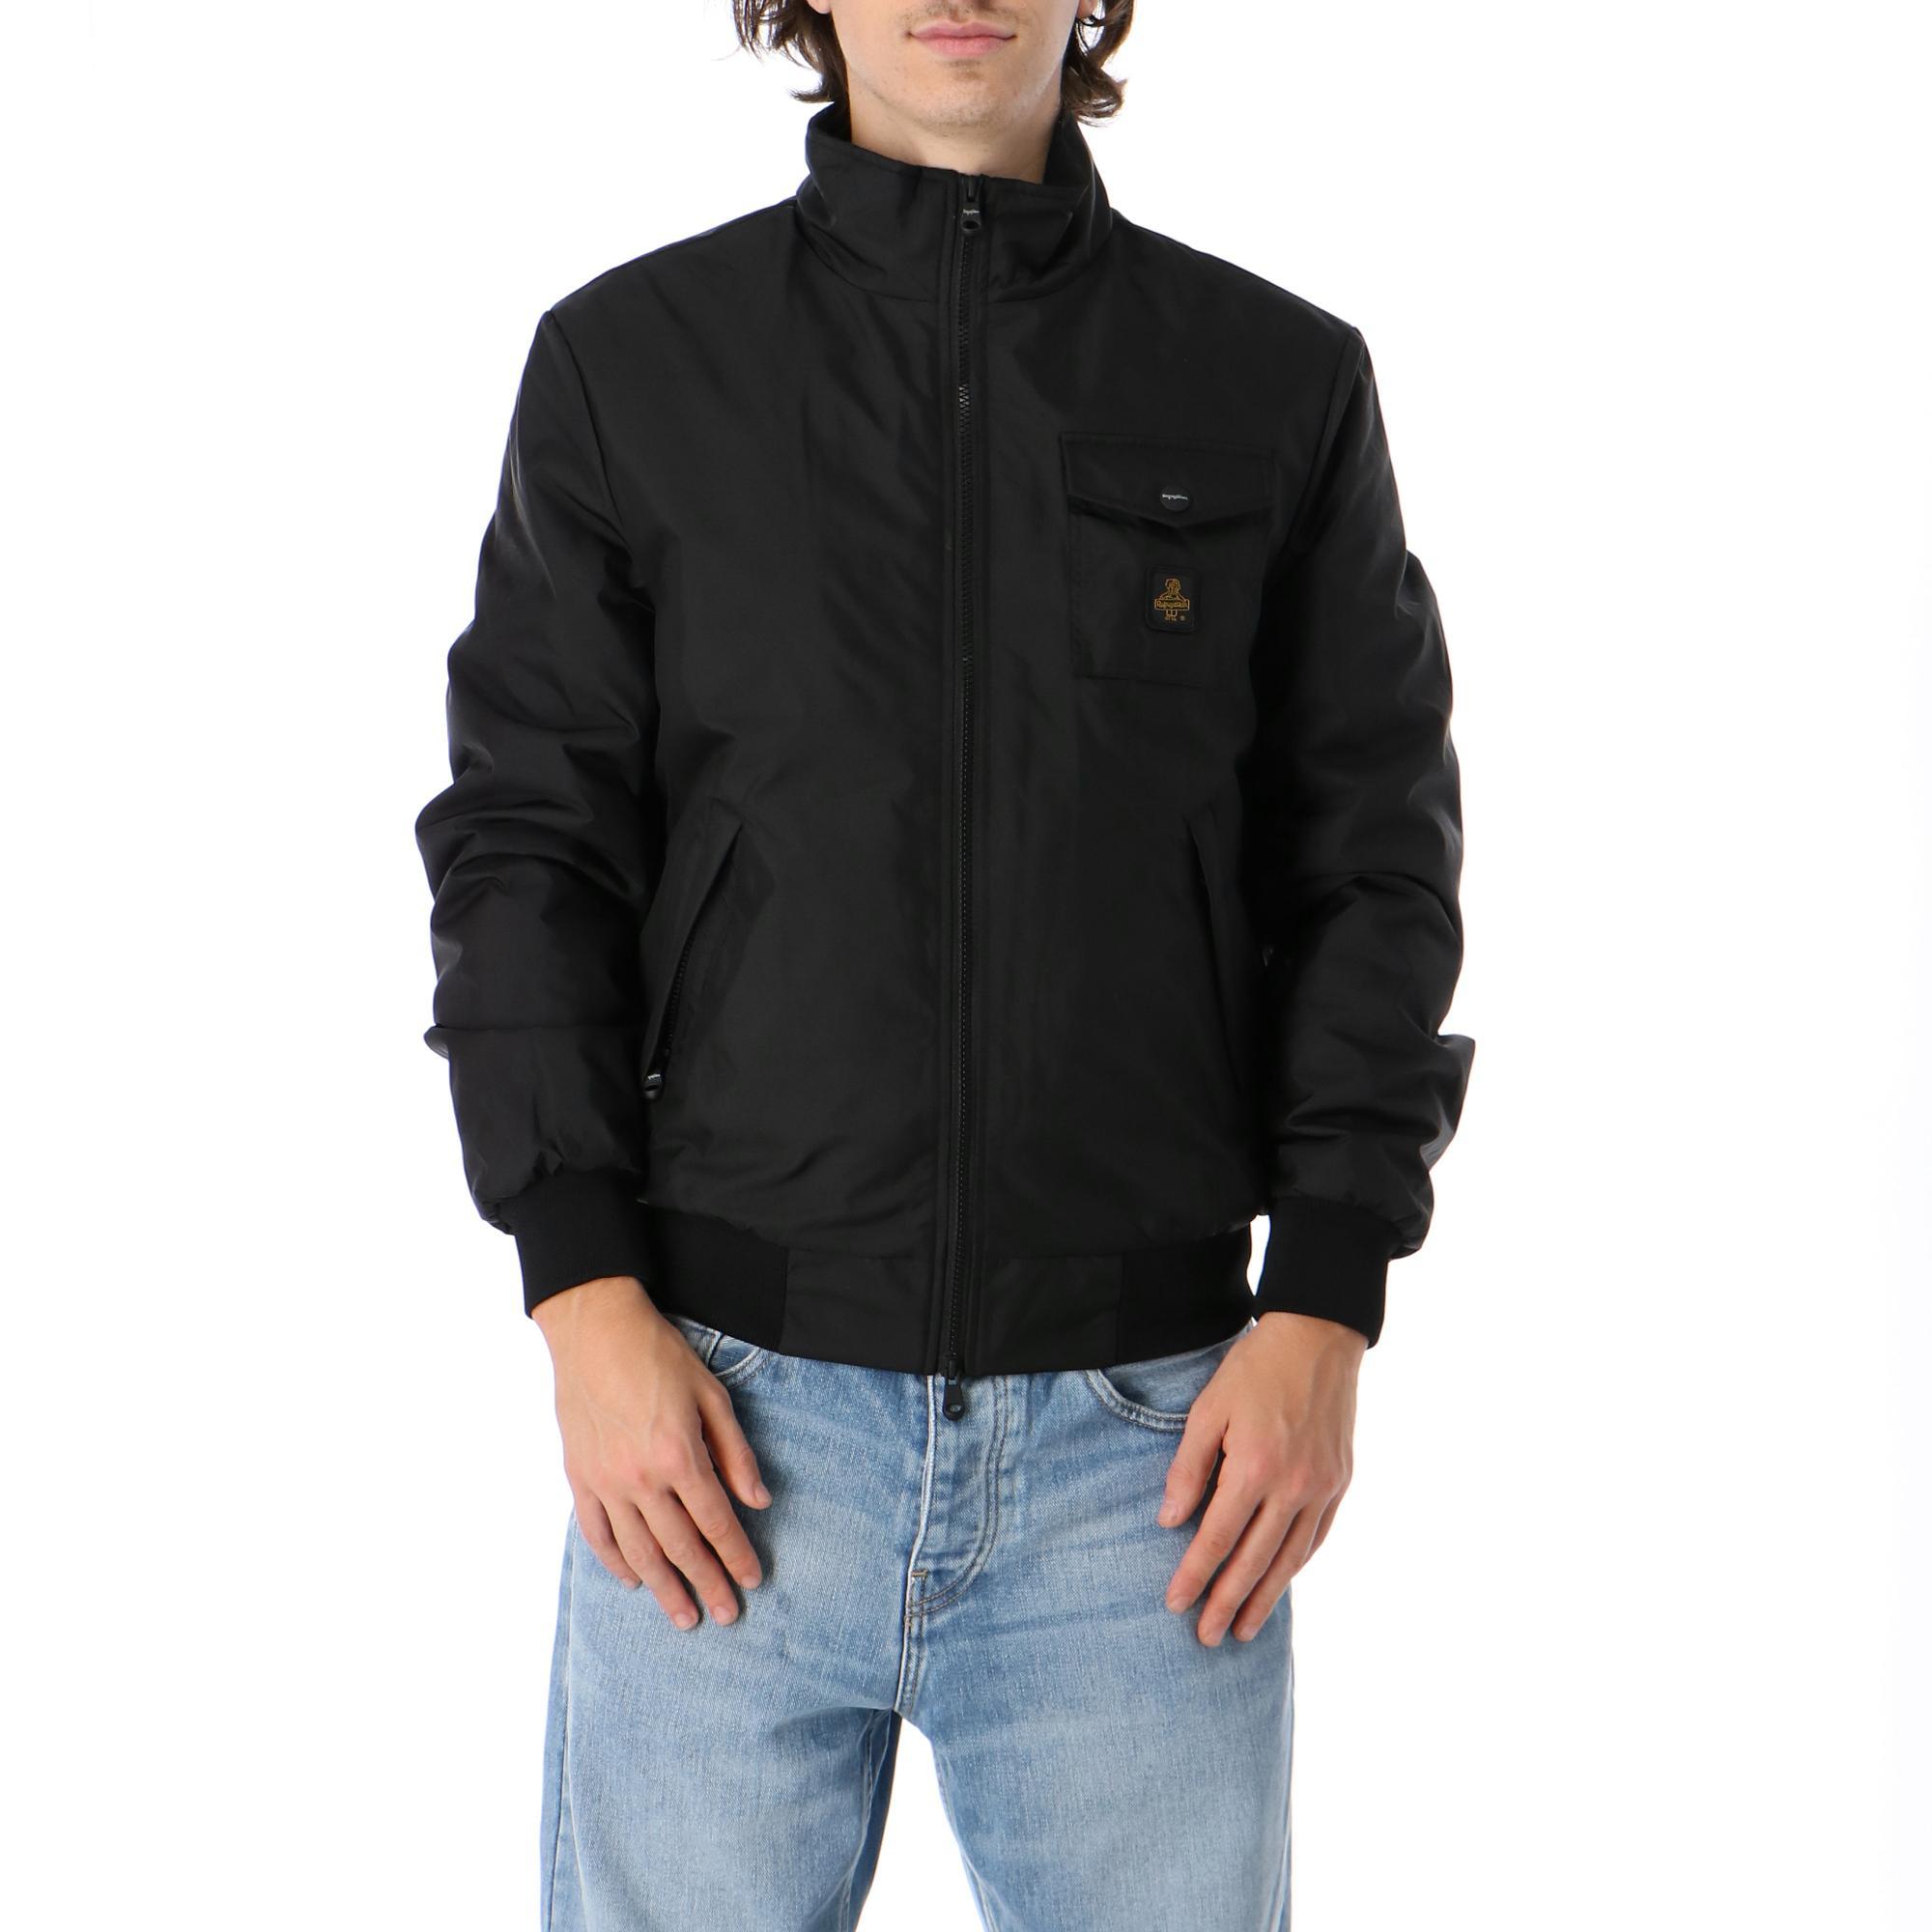 Refrigiwear New Captain Jacket BLACK